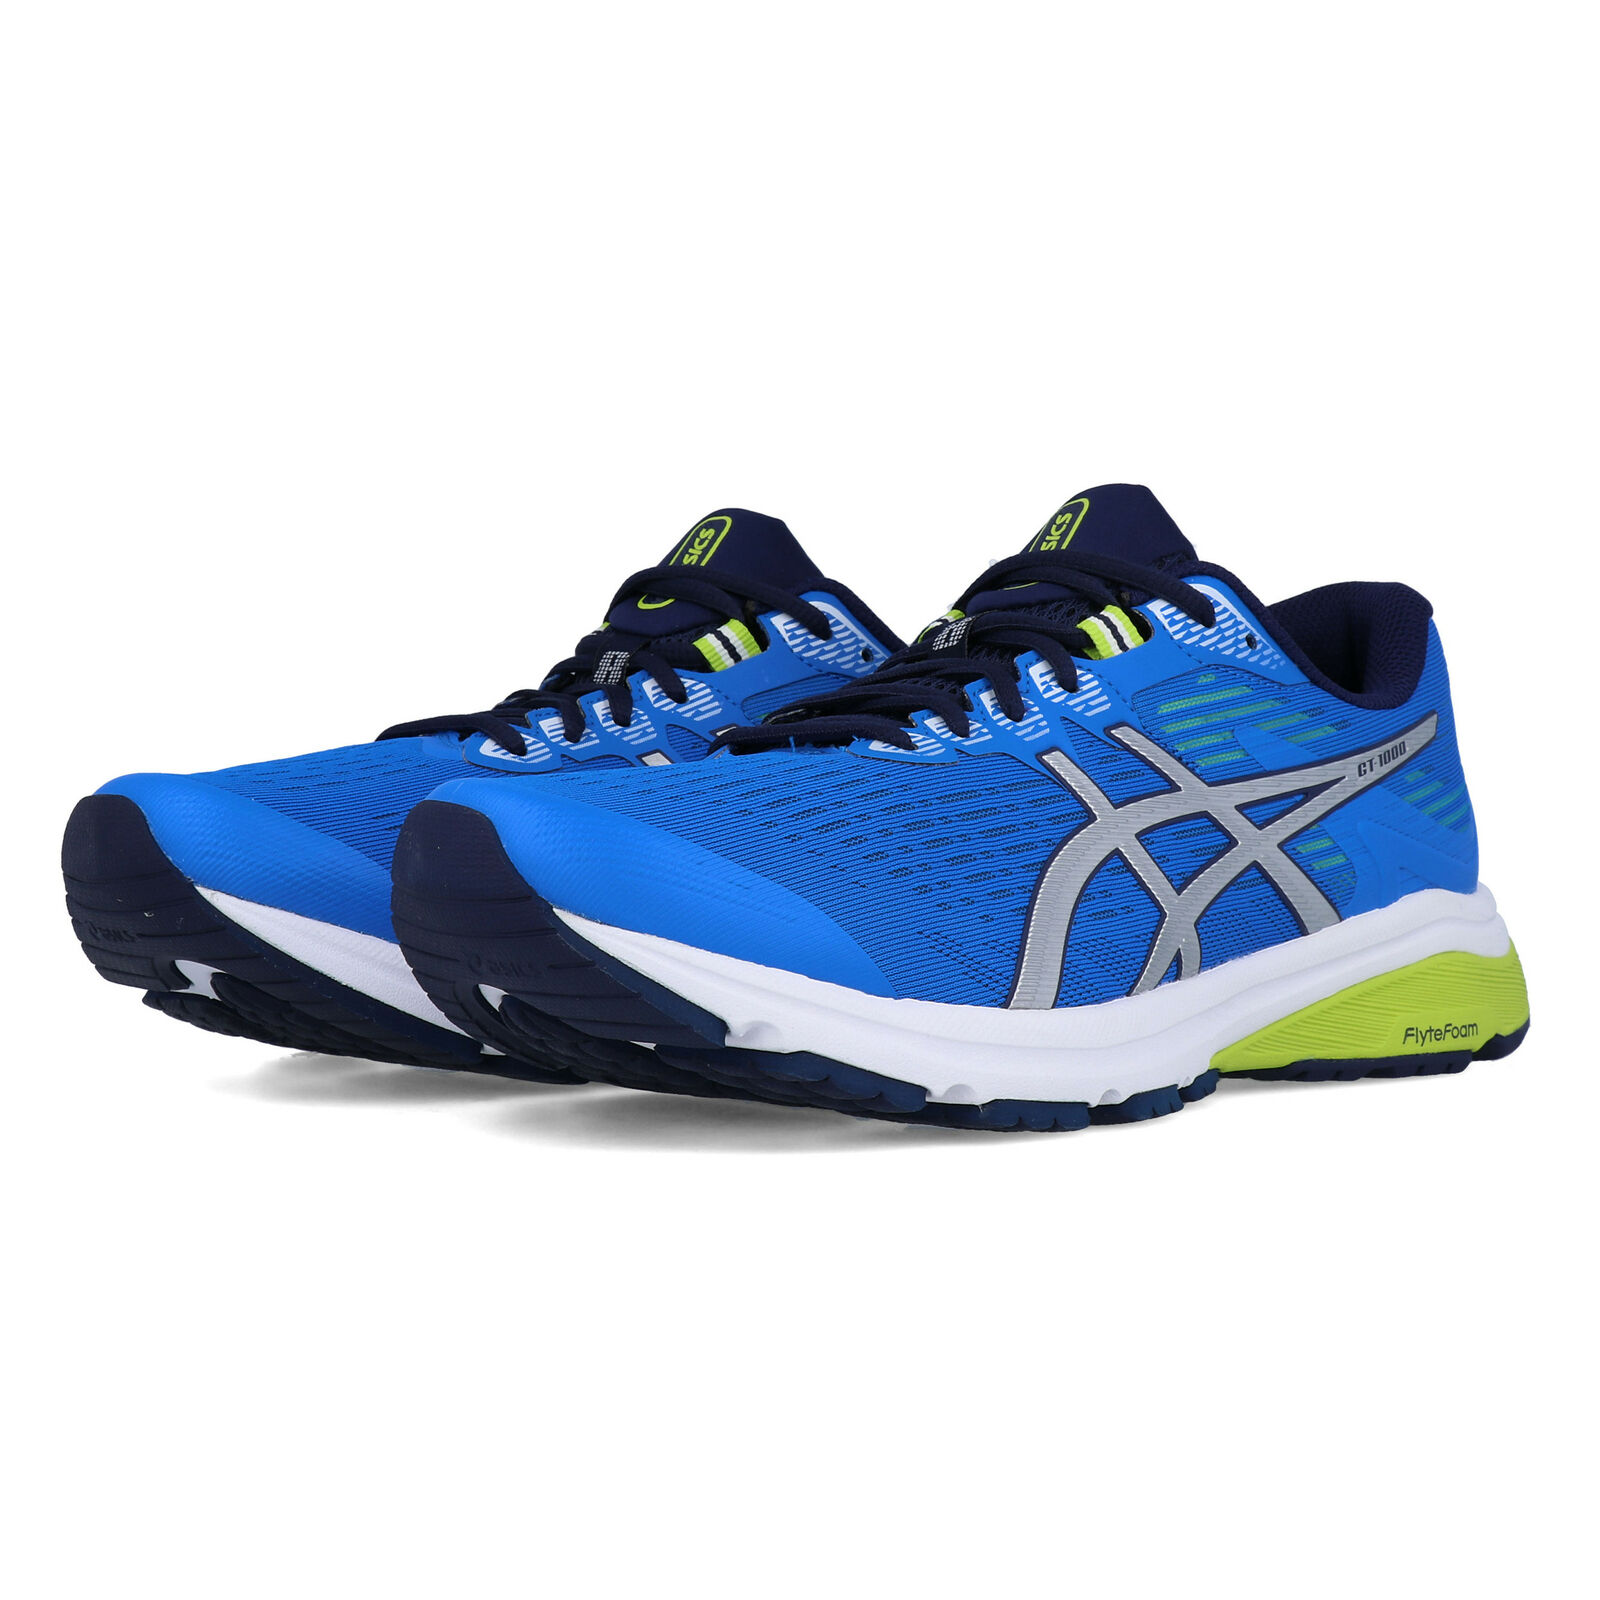 Asics Herren GT-1000 8 Turnschuhe Laufschuhe Sport Jogging Turnschuhe Schuhe Blau